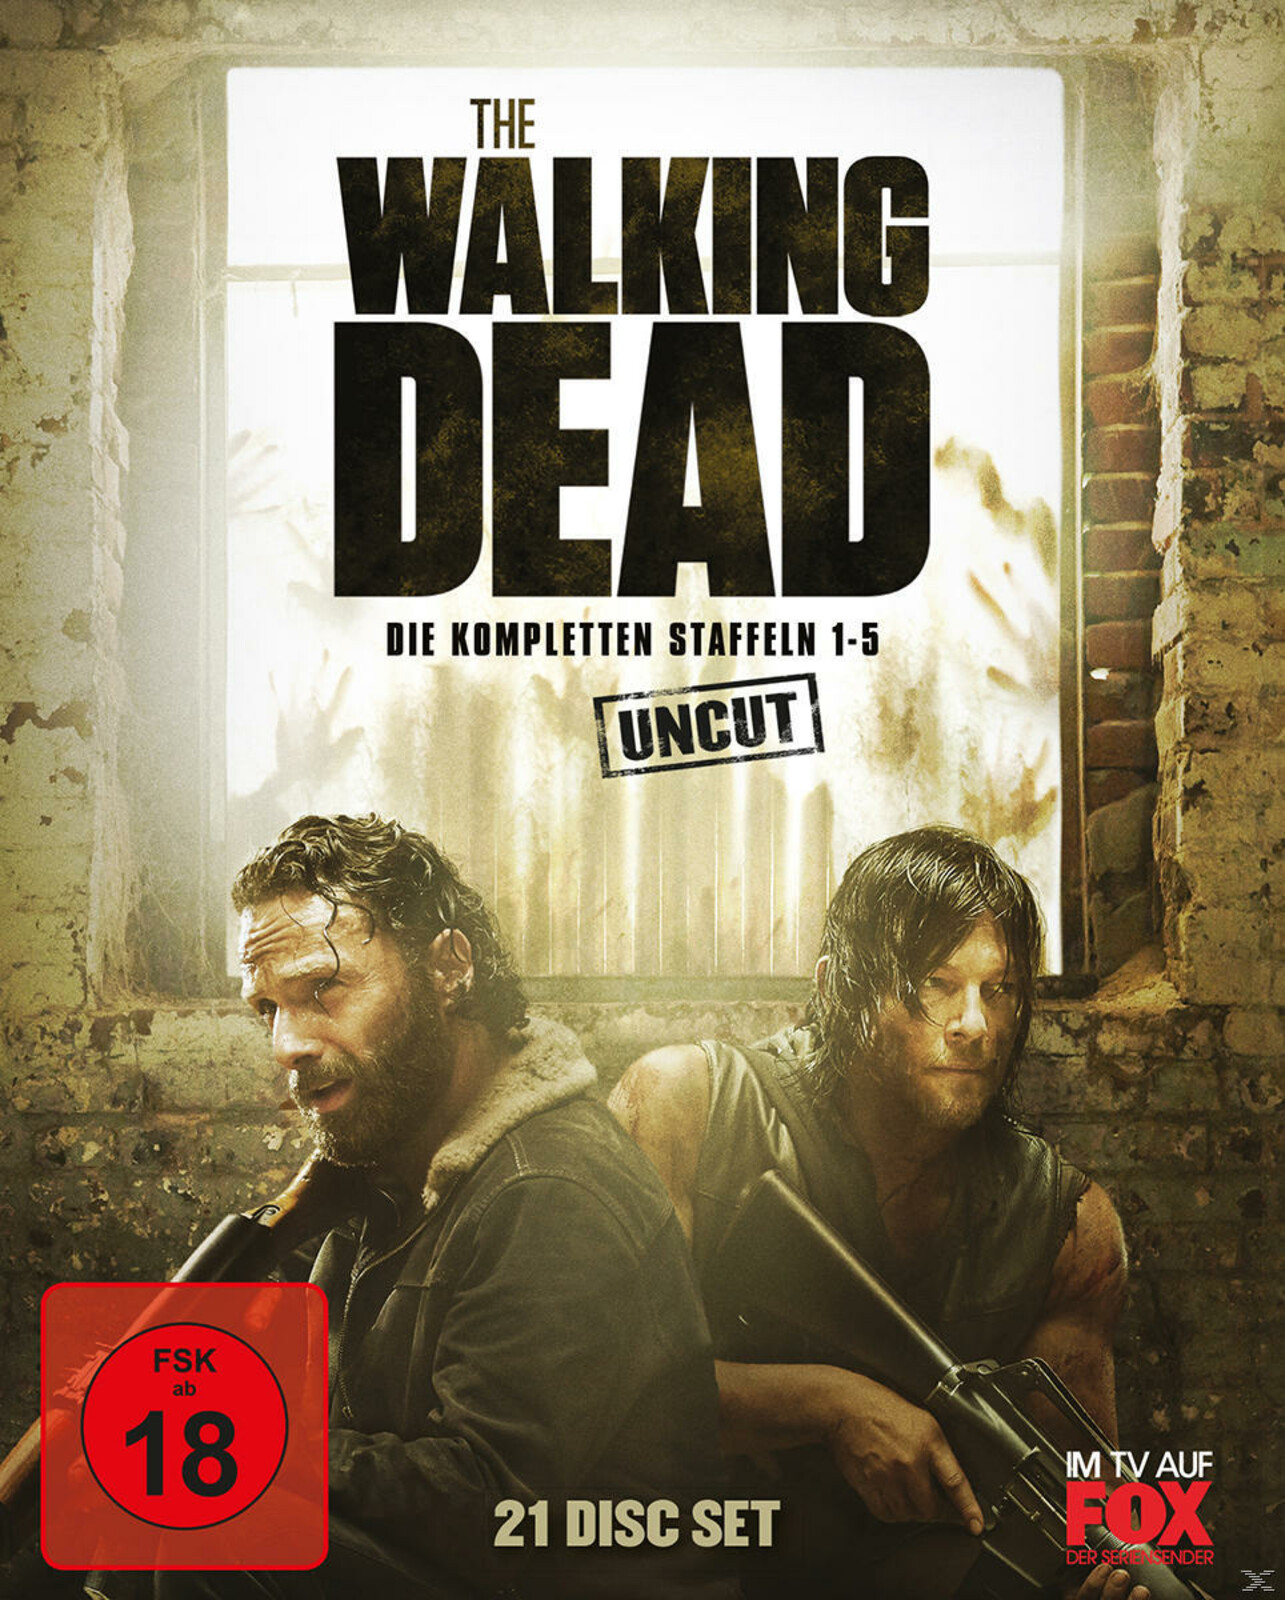 The Walking Dead 1-5 Box - UNCUT (BD) [Blu-ray]